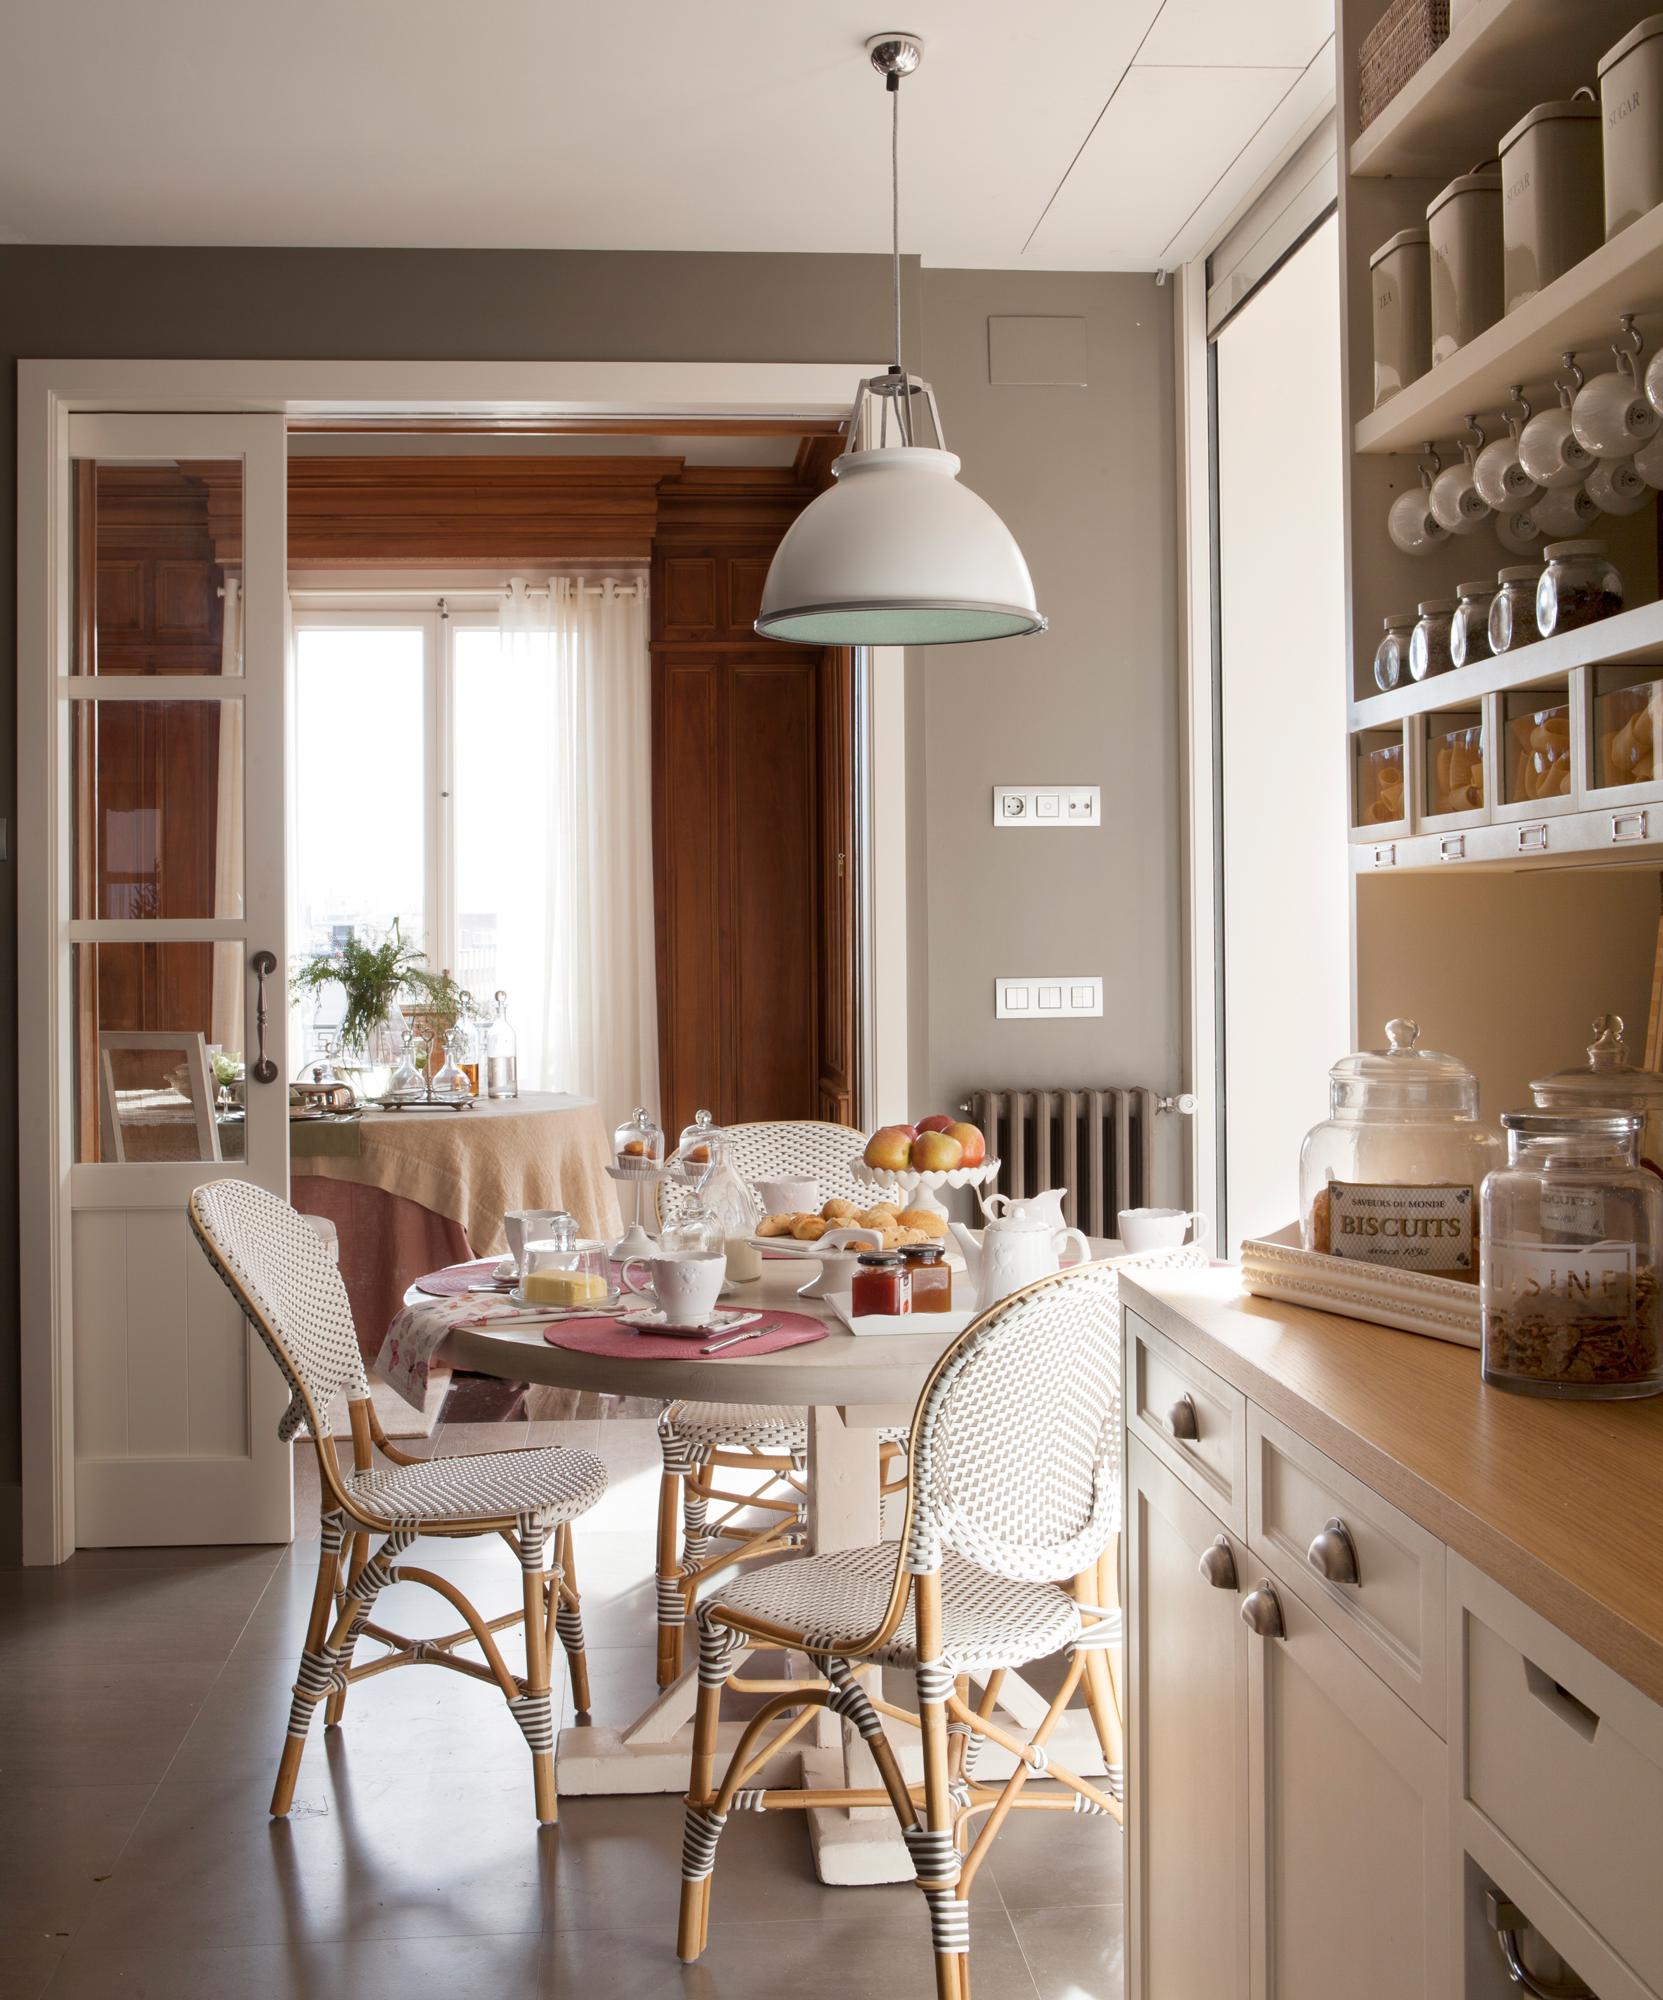 12 00379013 O. Pequeña office junto a la cocina con sillas blancas de fibra_12 00379013 O